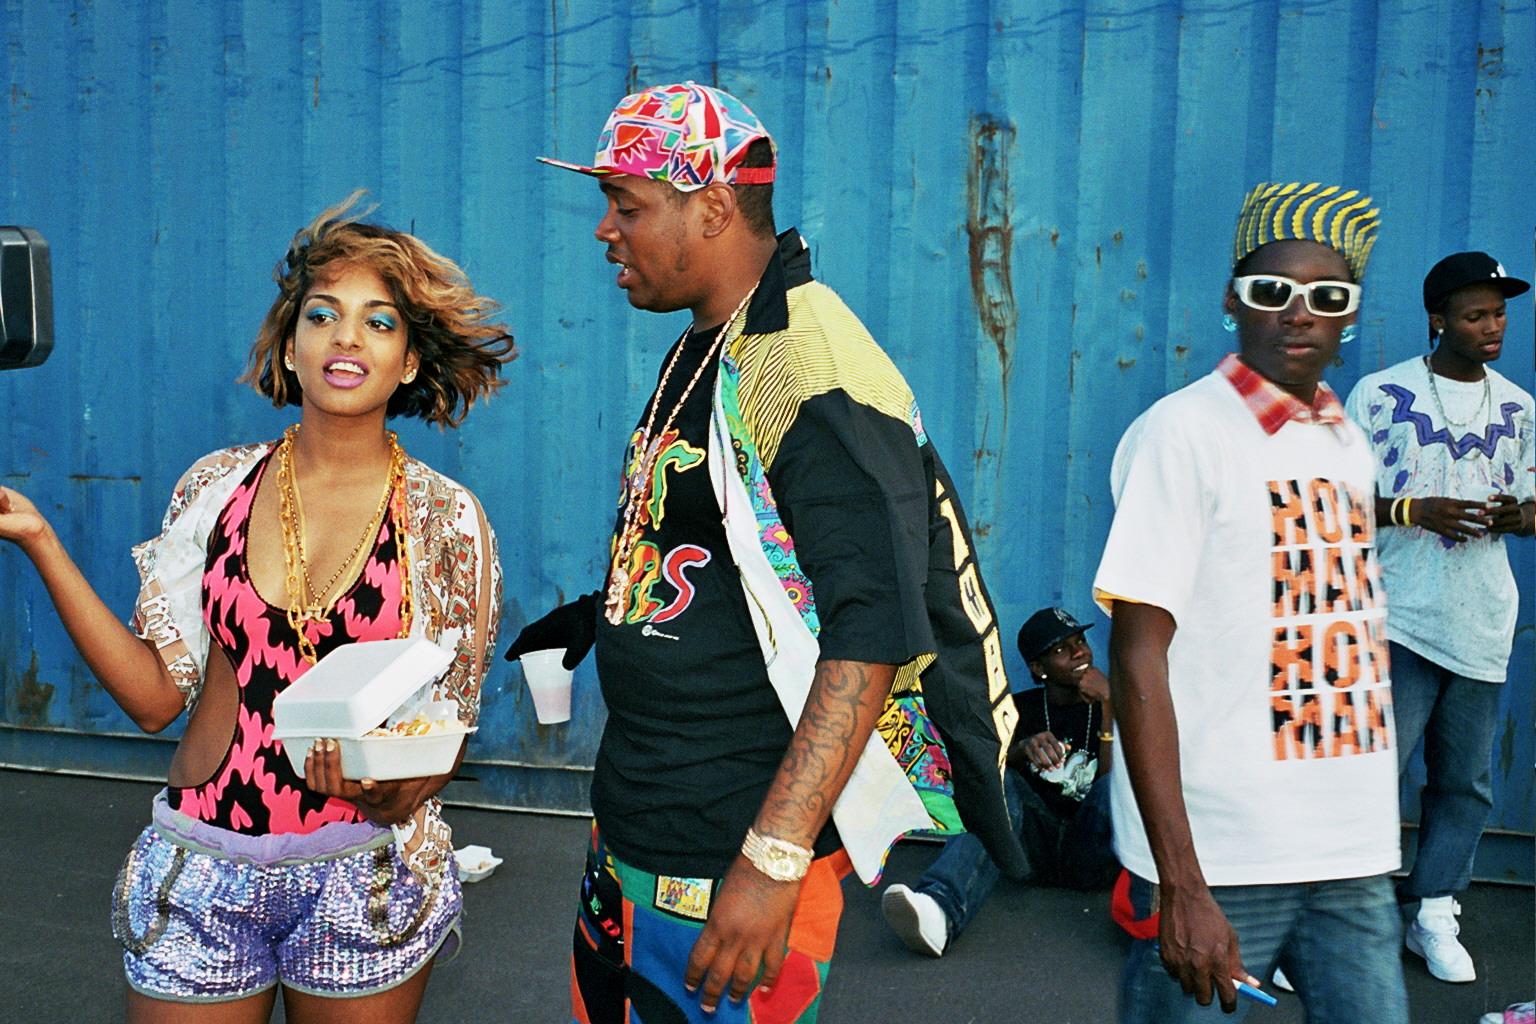 Hip hop fashion - Wikipedia 11